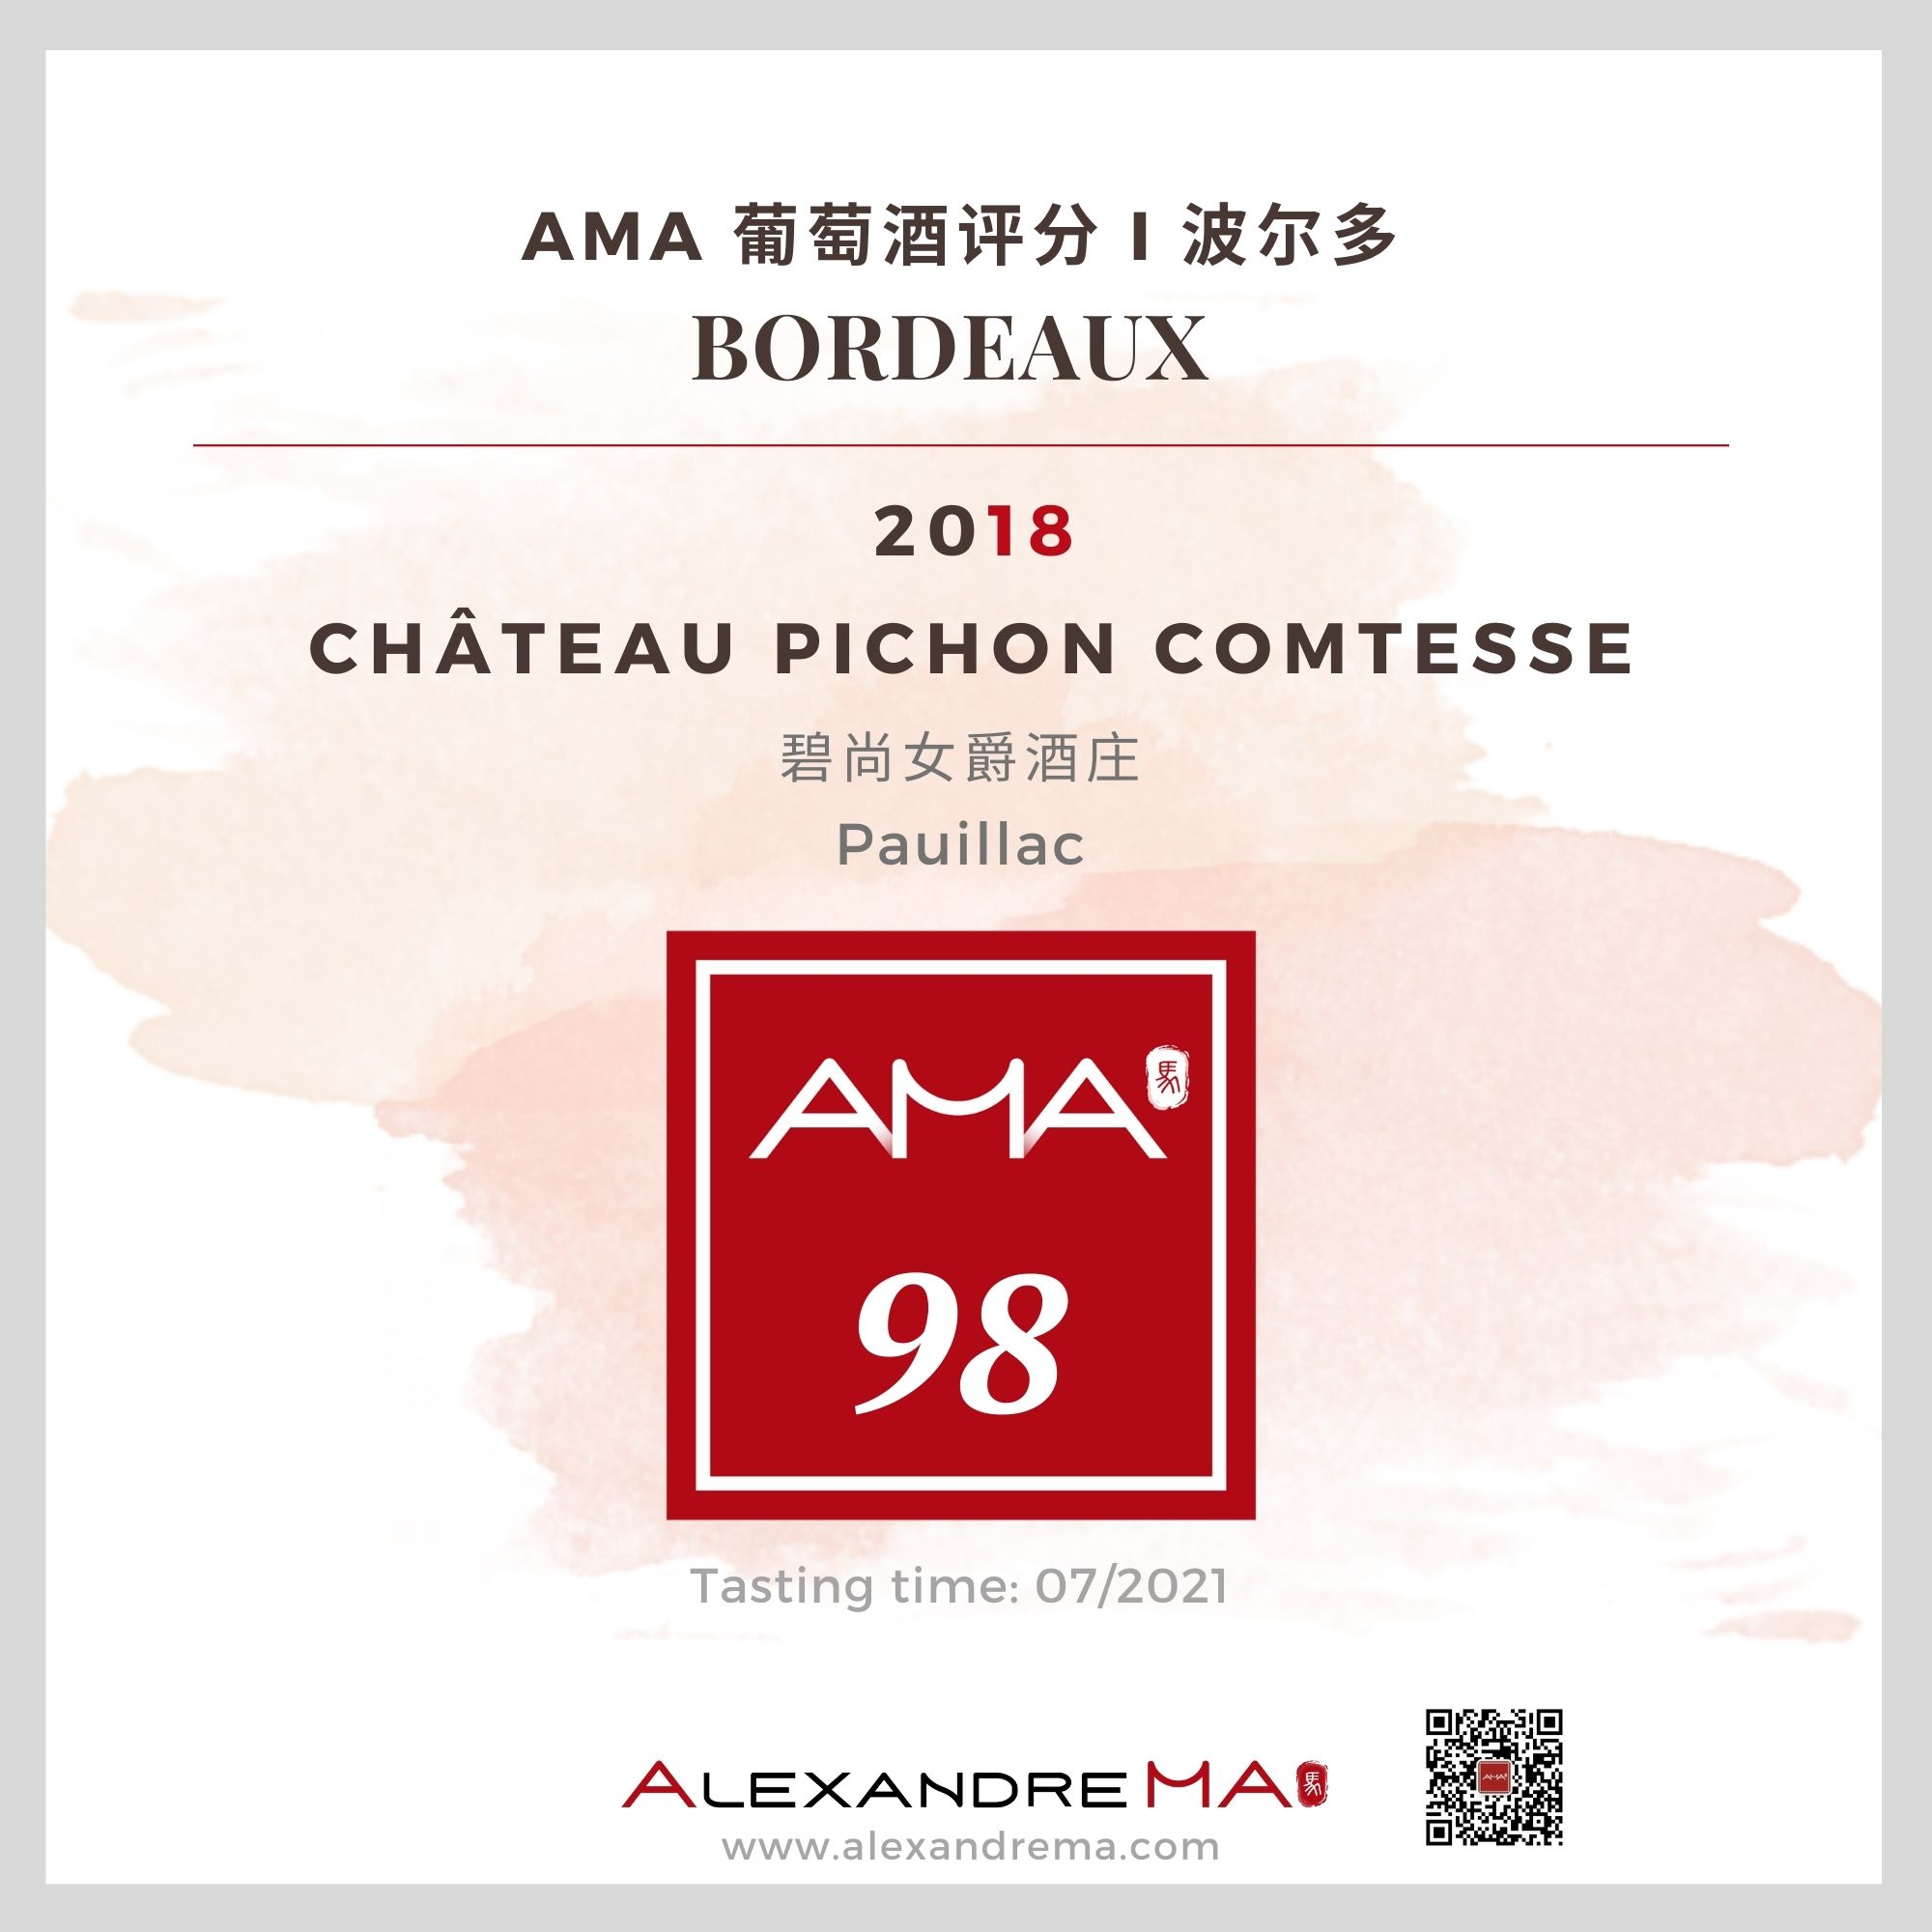 Château Pichon Comtesse 2018 - Alexandre MA